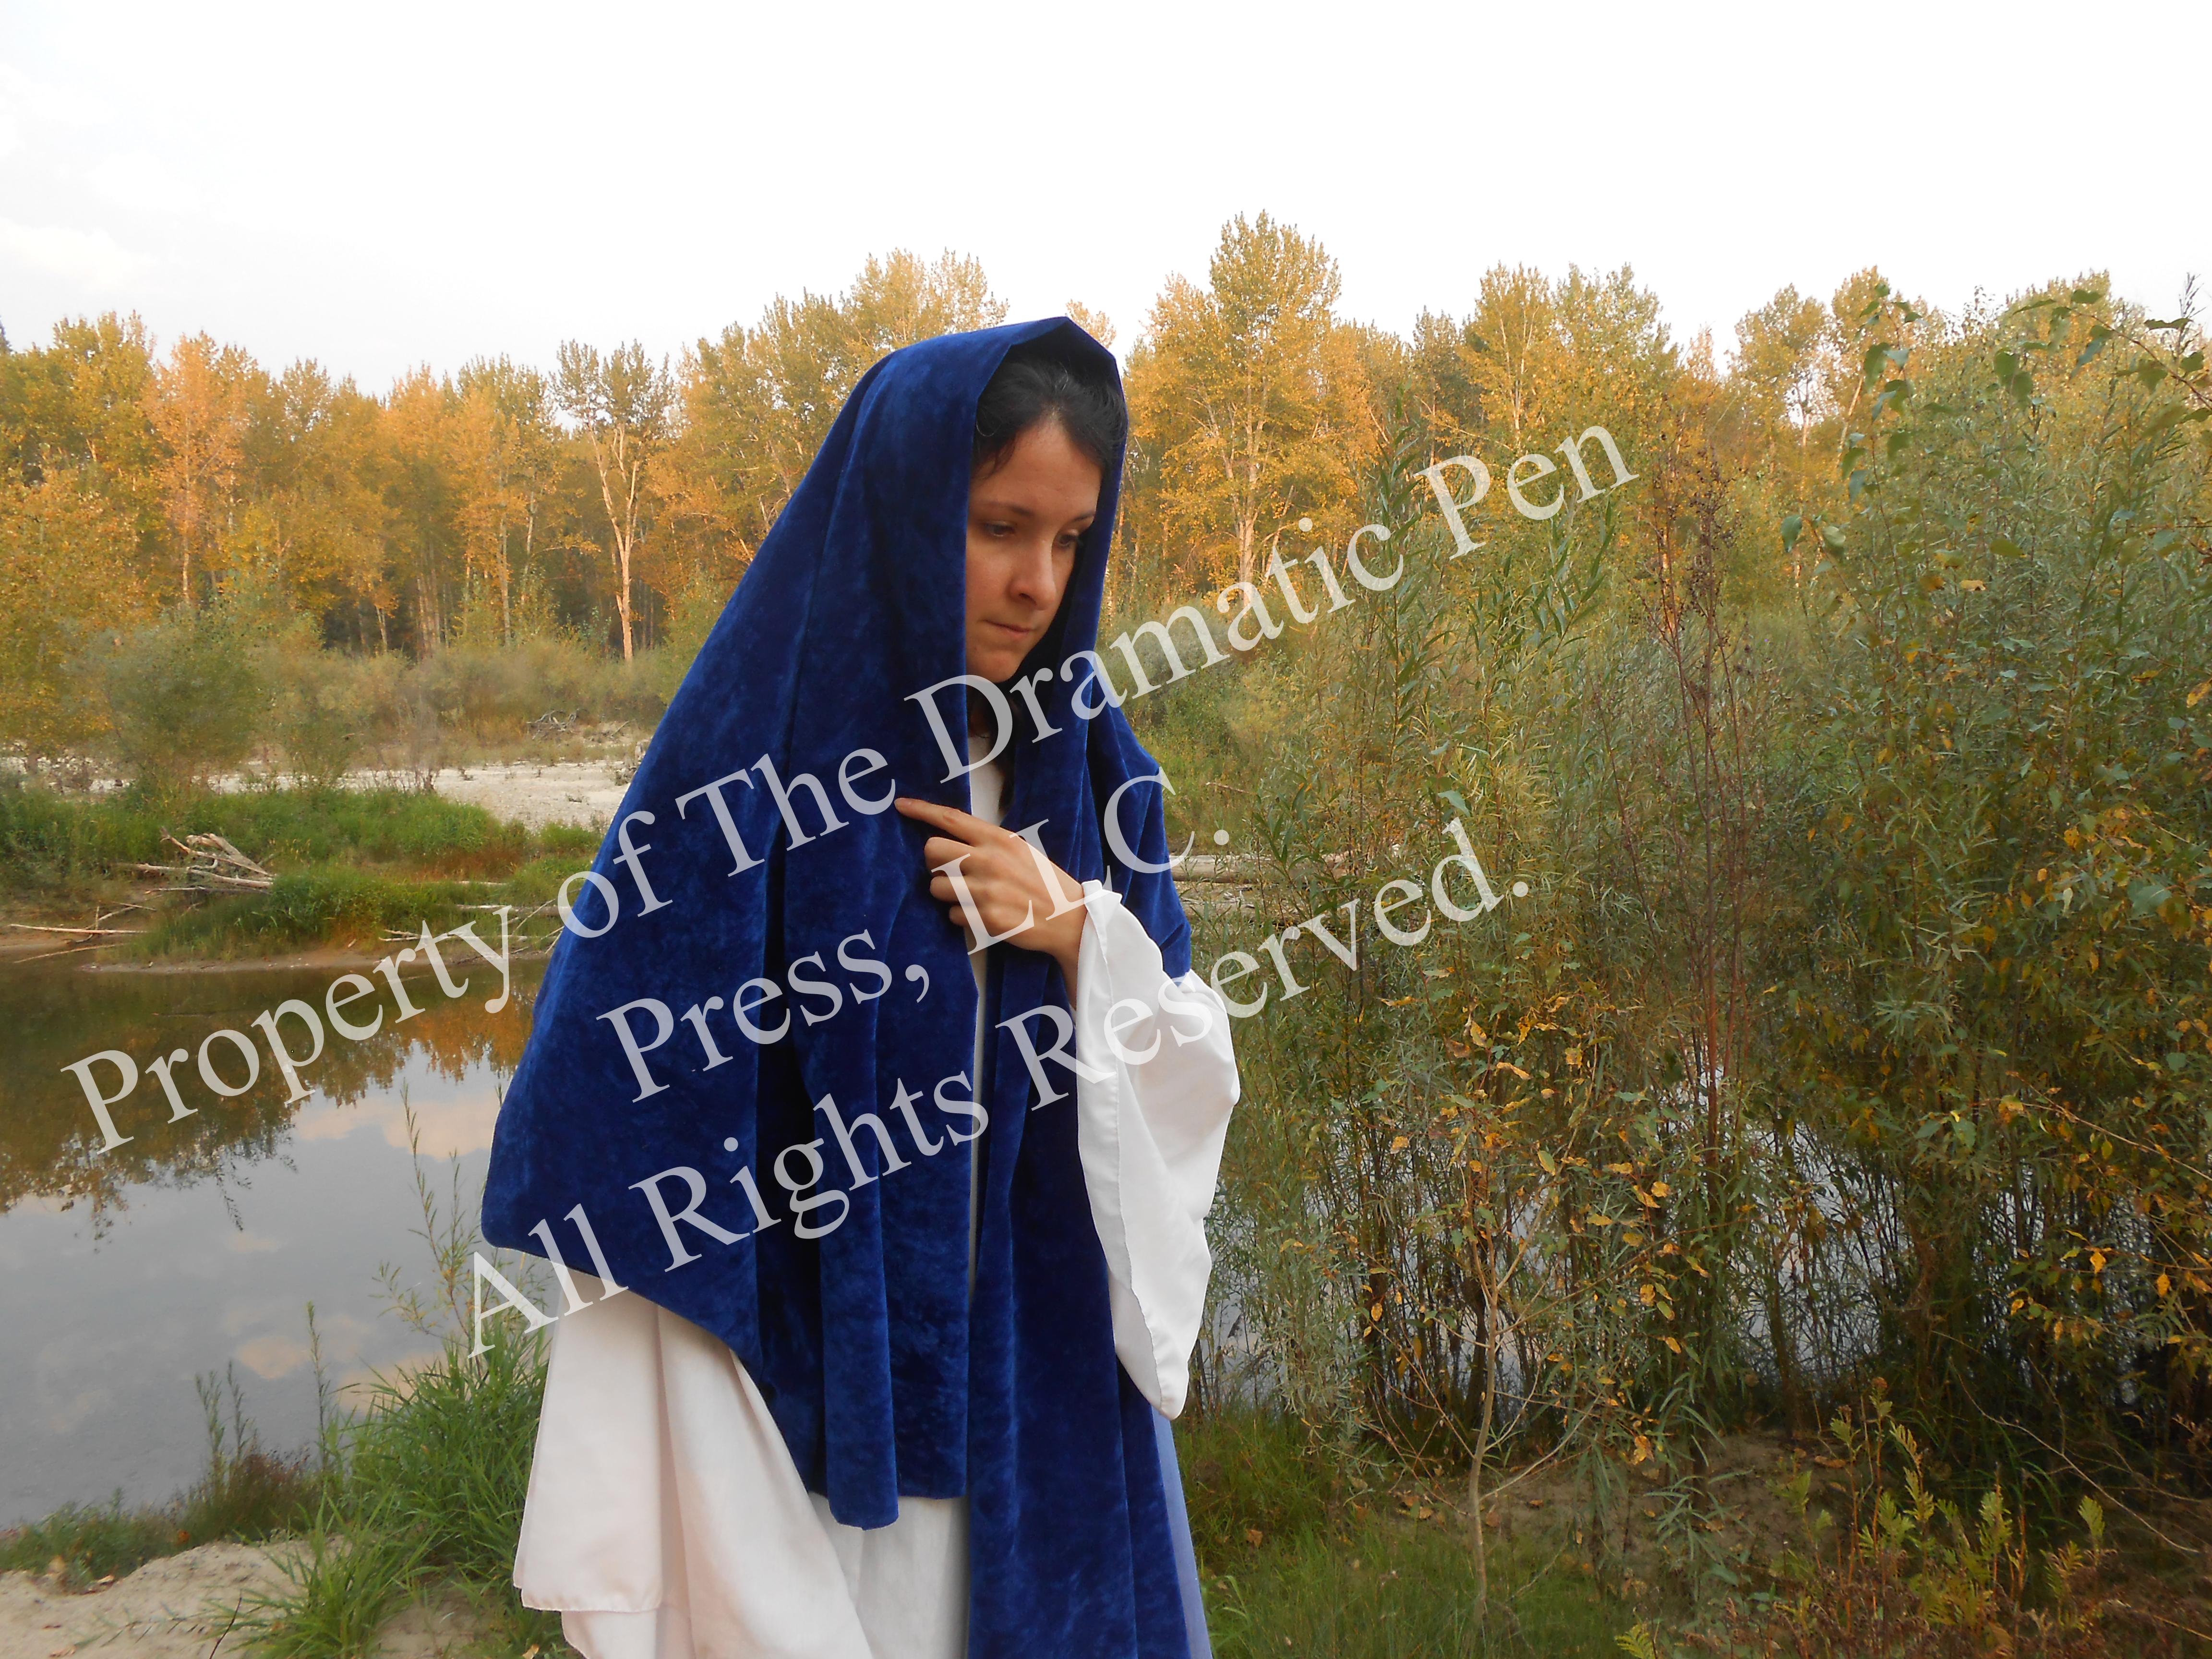 Biblical Woman Walks by River